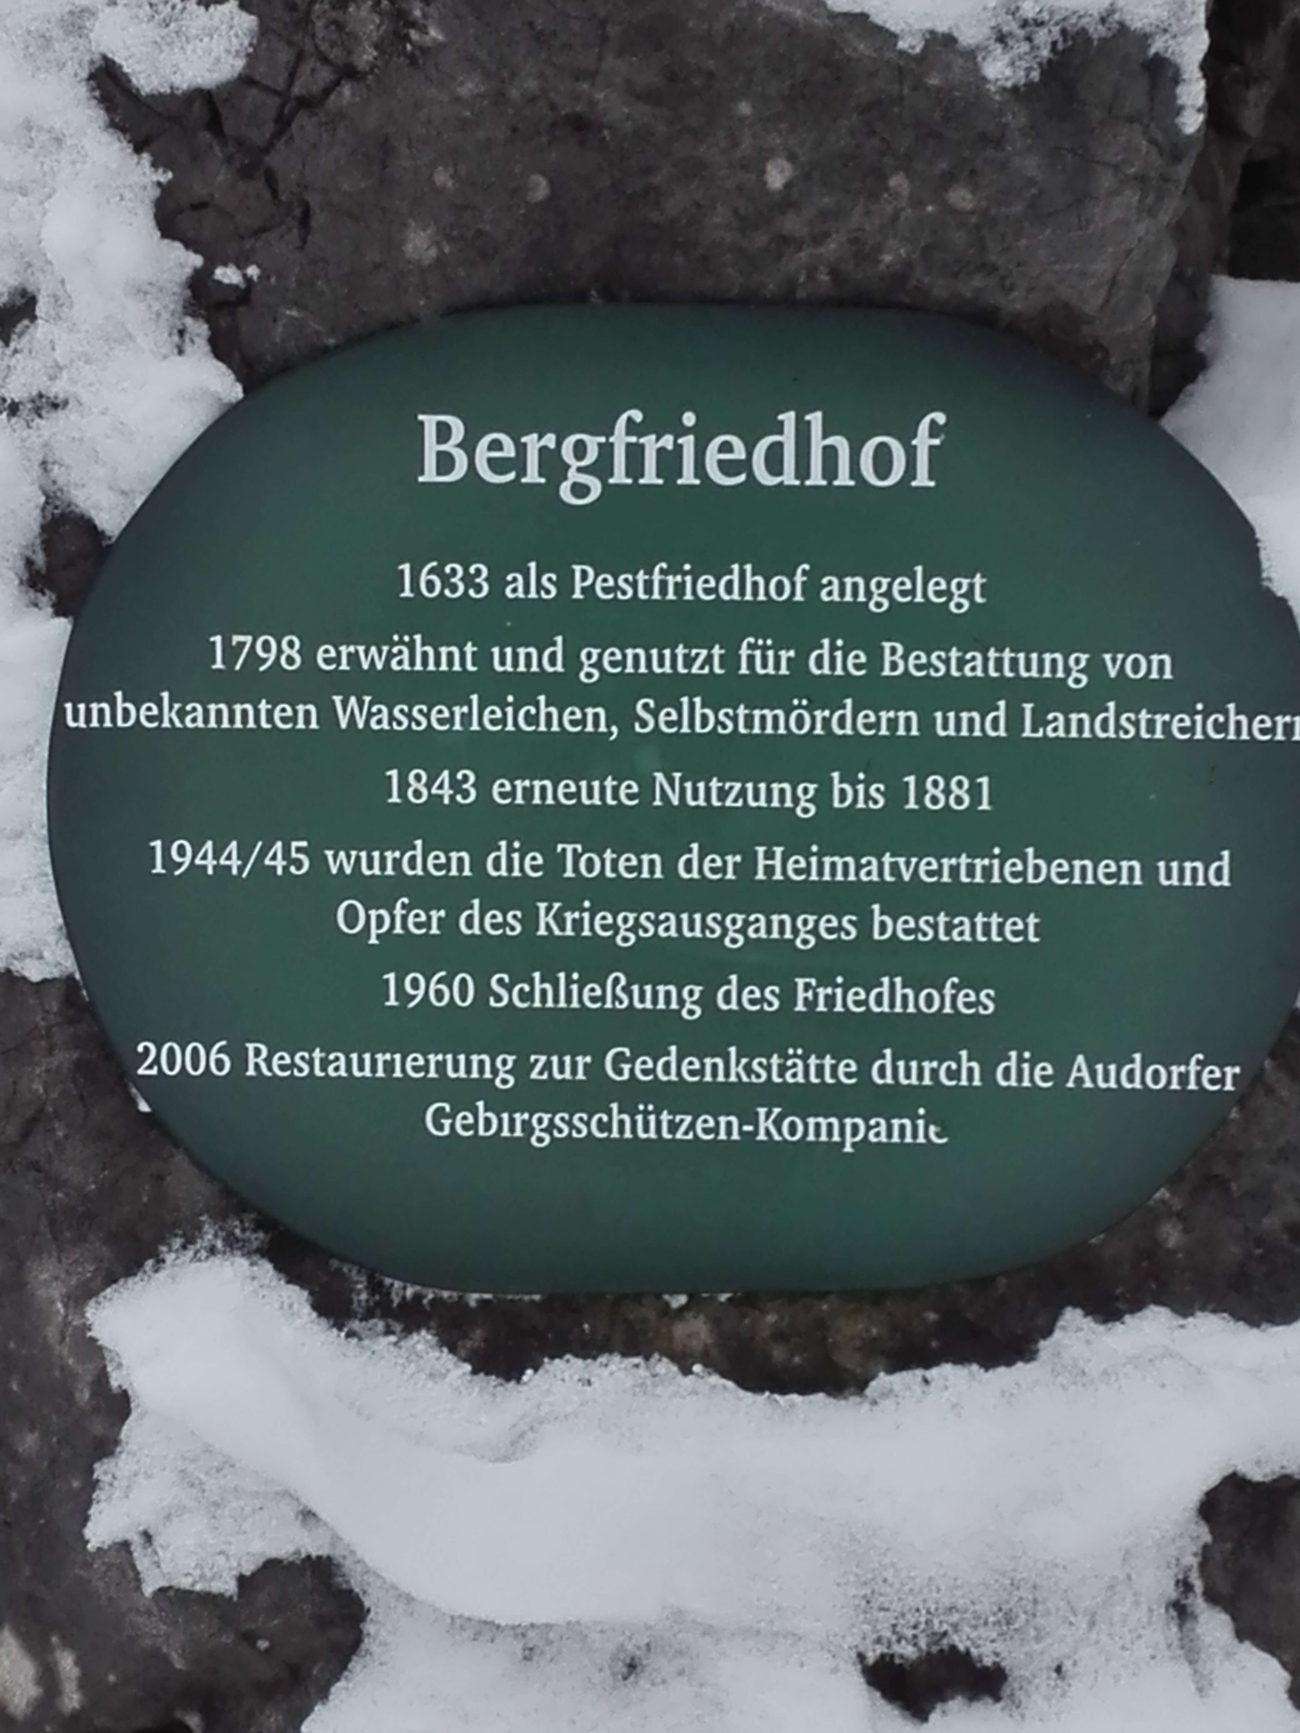 13 Hocheck Foststrasse Bergfiedhof